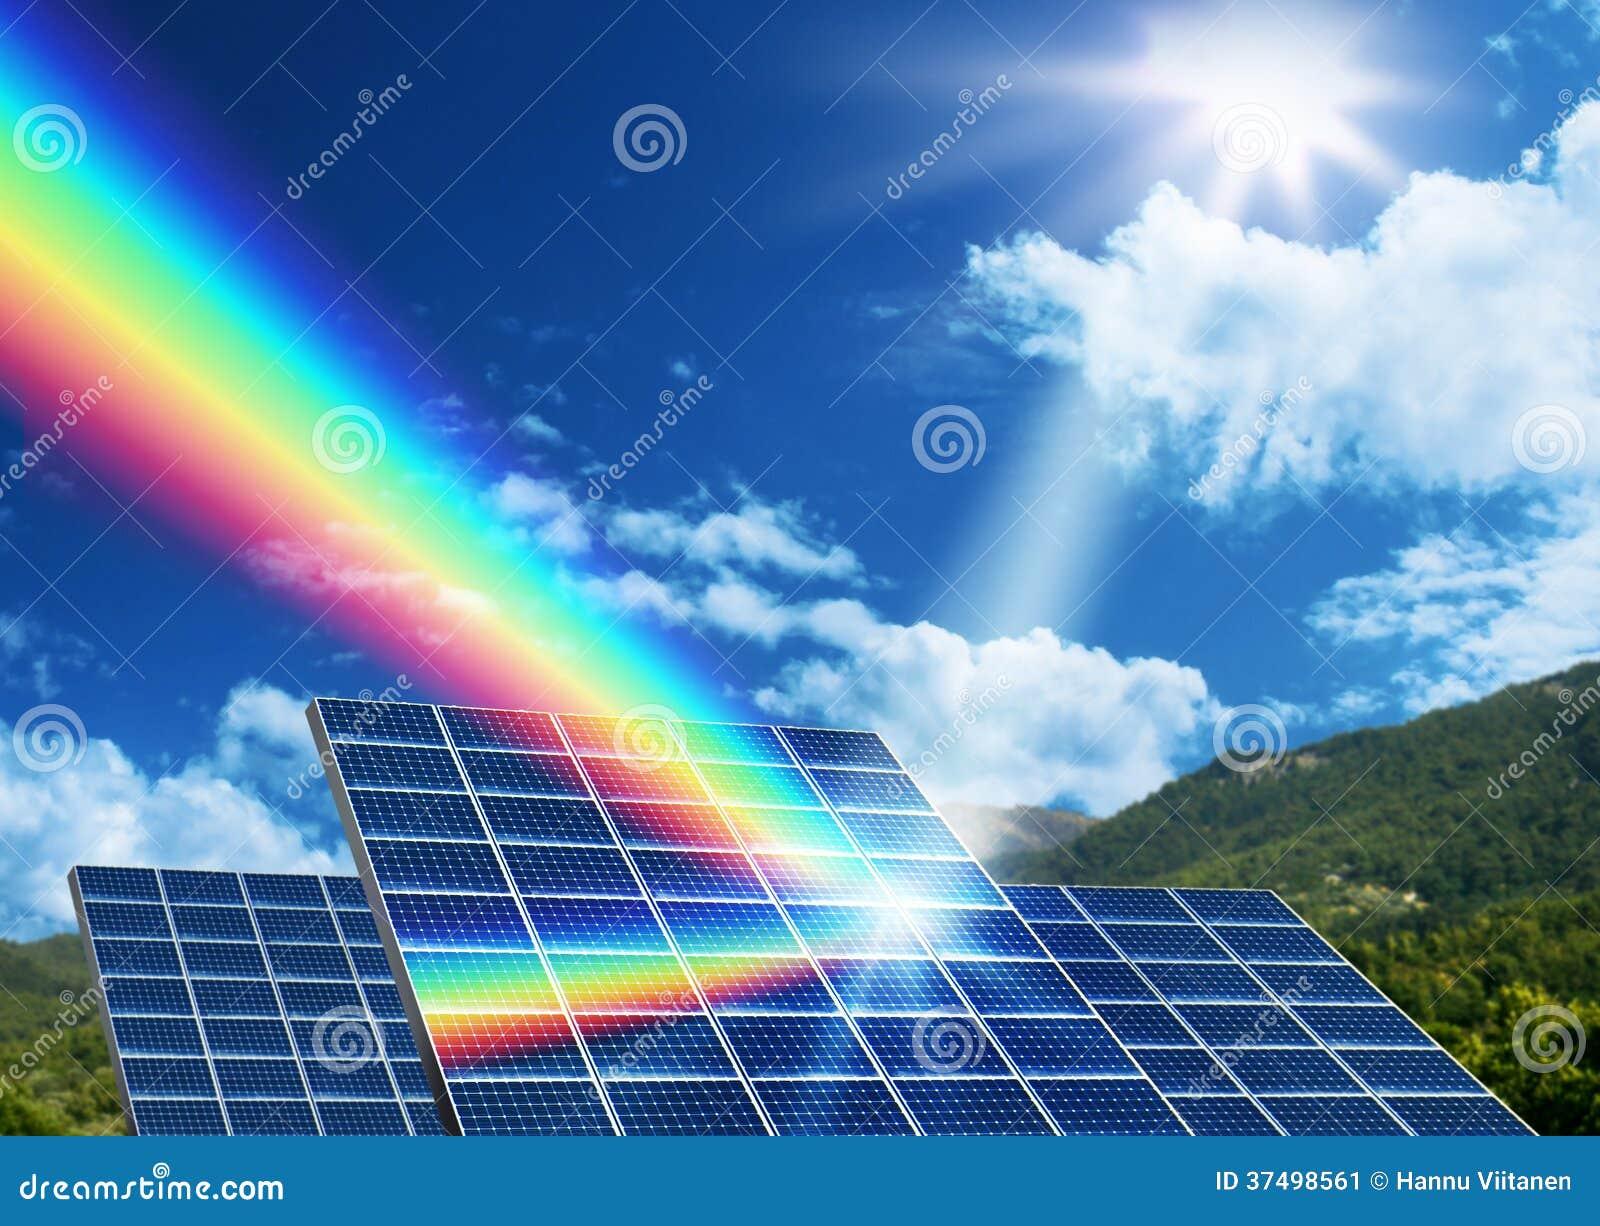 Solar Energy Renewable Energy Concept Stock Image Image